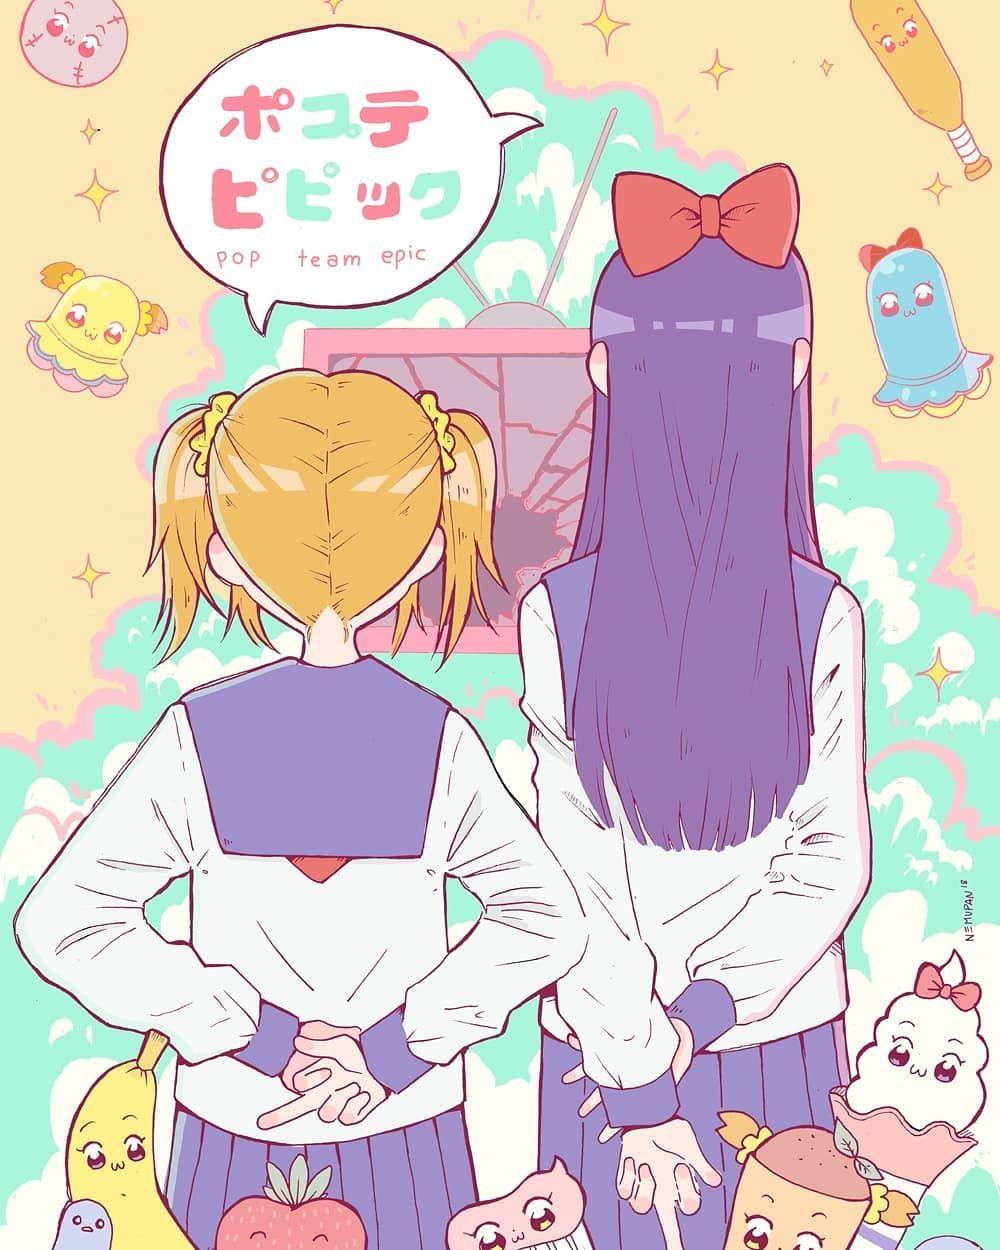 12 9k Likes 45 Comments Nemupan On Instagram Poputepipikku Popteamepic Man I Love This Show Full Ver Nemupan Tum Anime Cute Anime Character Anime Art